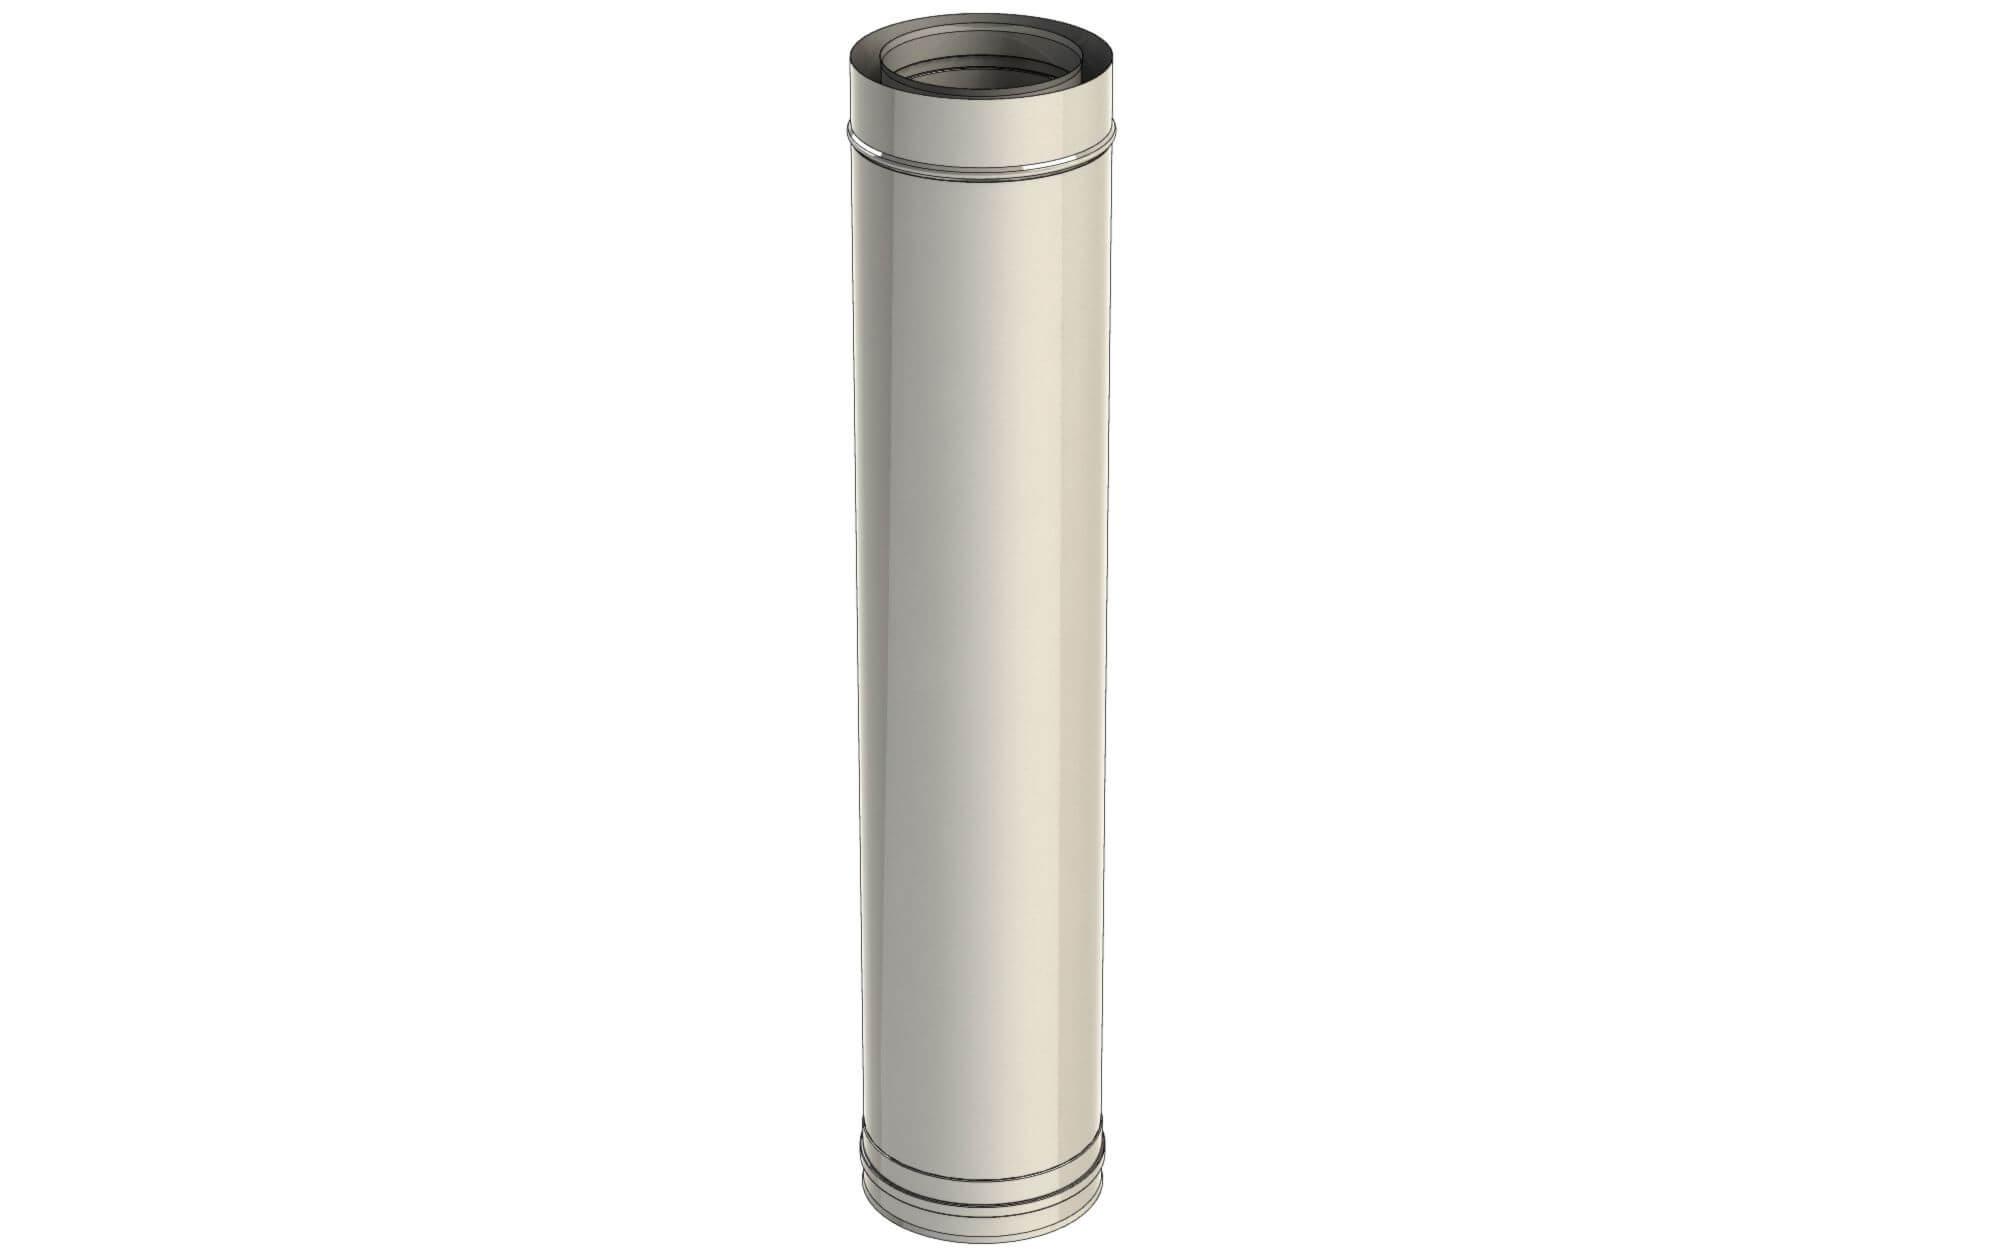 element-droit-1000mm-inox-twin-biosmass